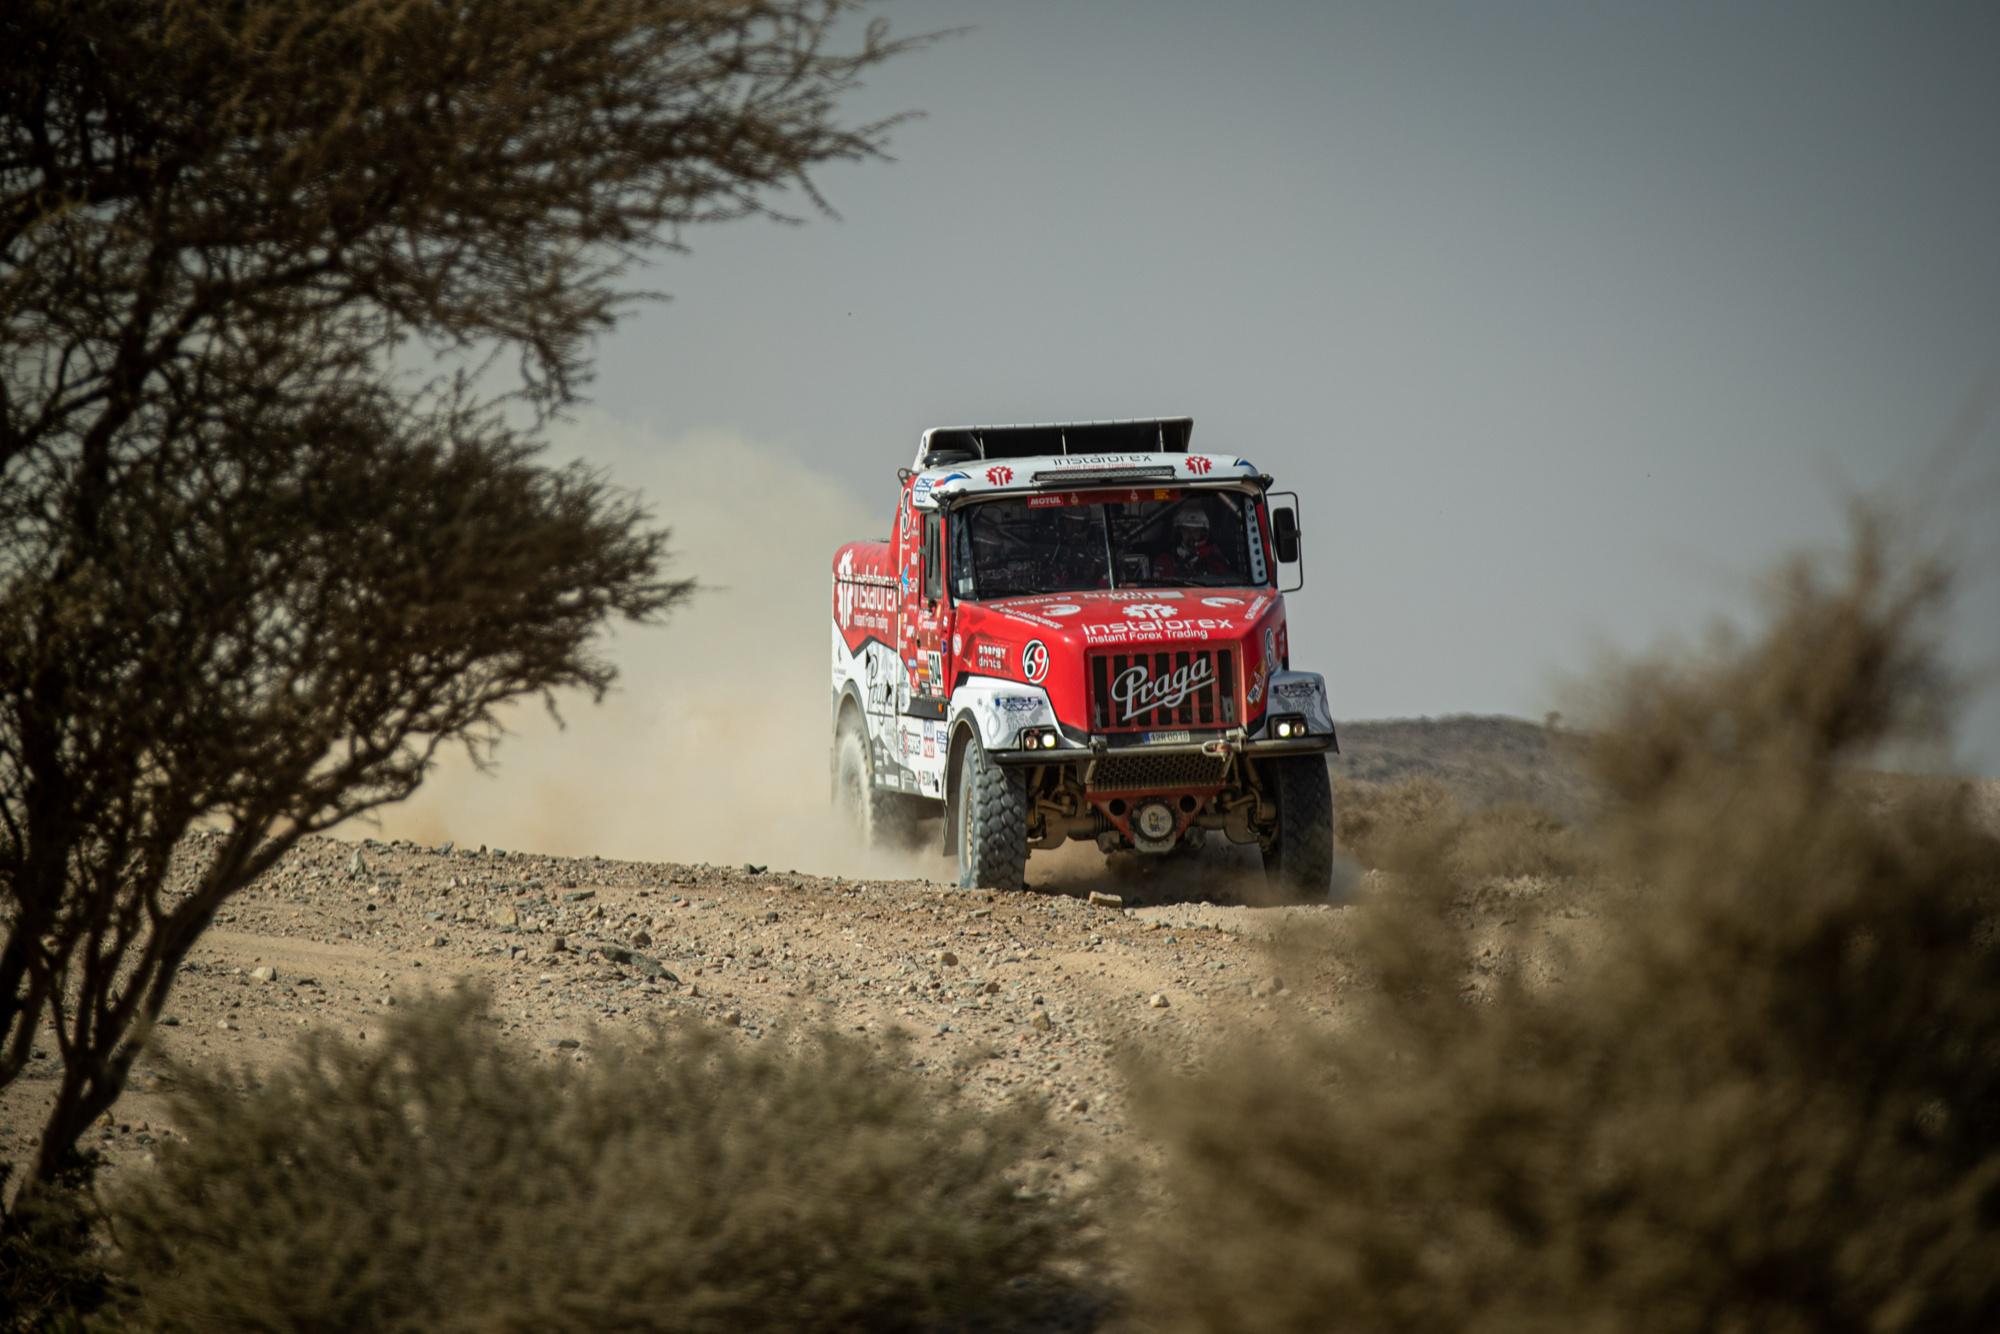 Dakar 2021: Nerve-wracking but beautiful second place for Loprais